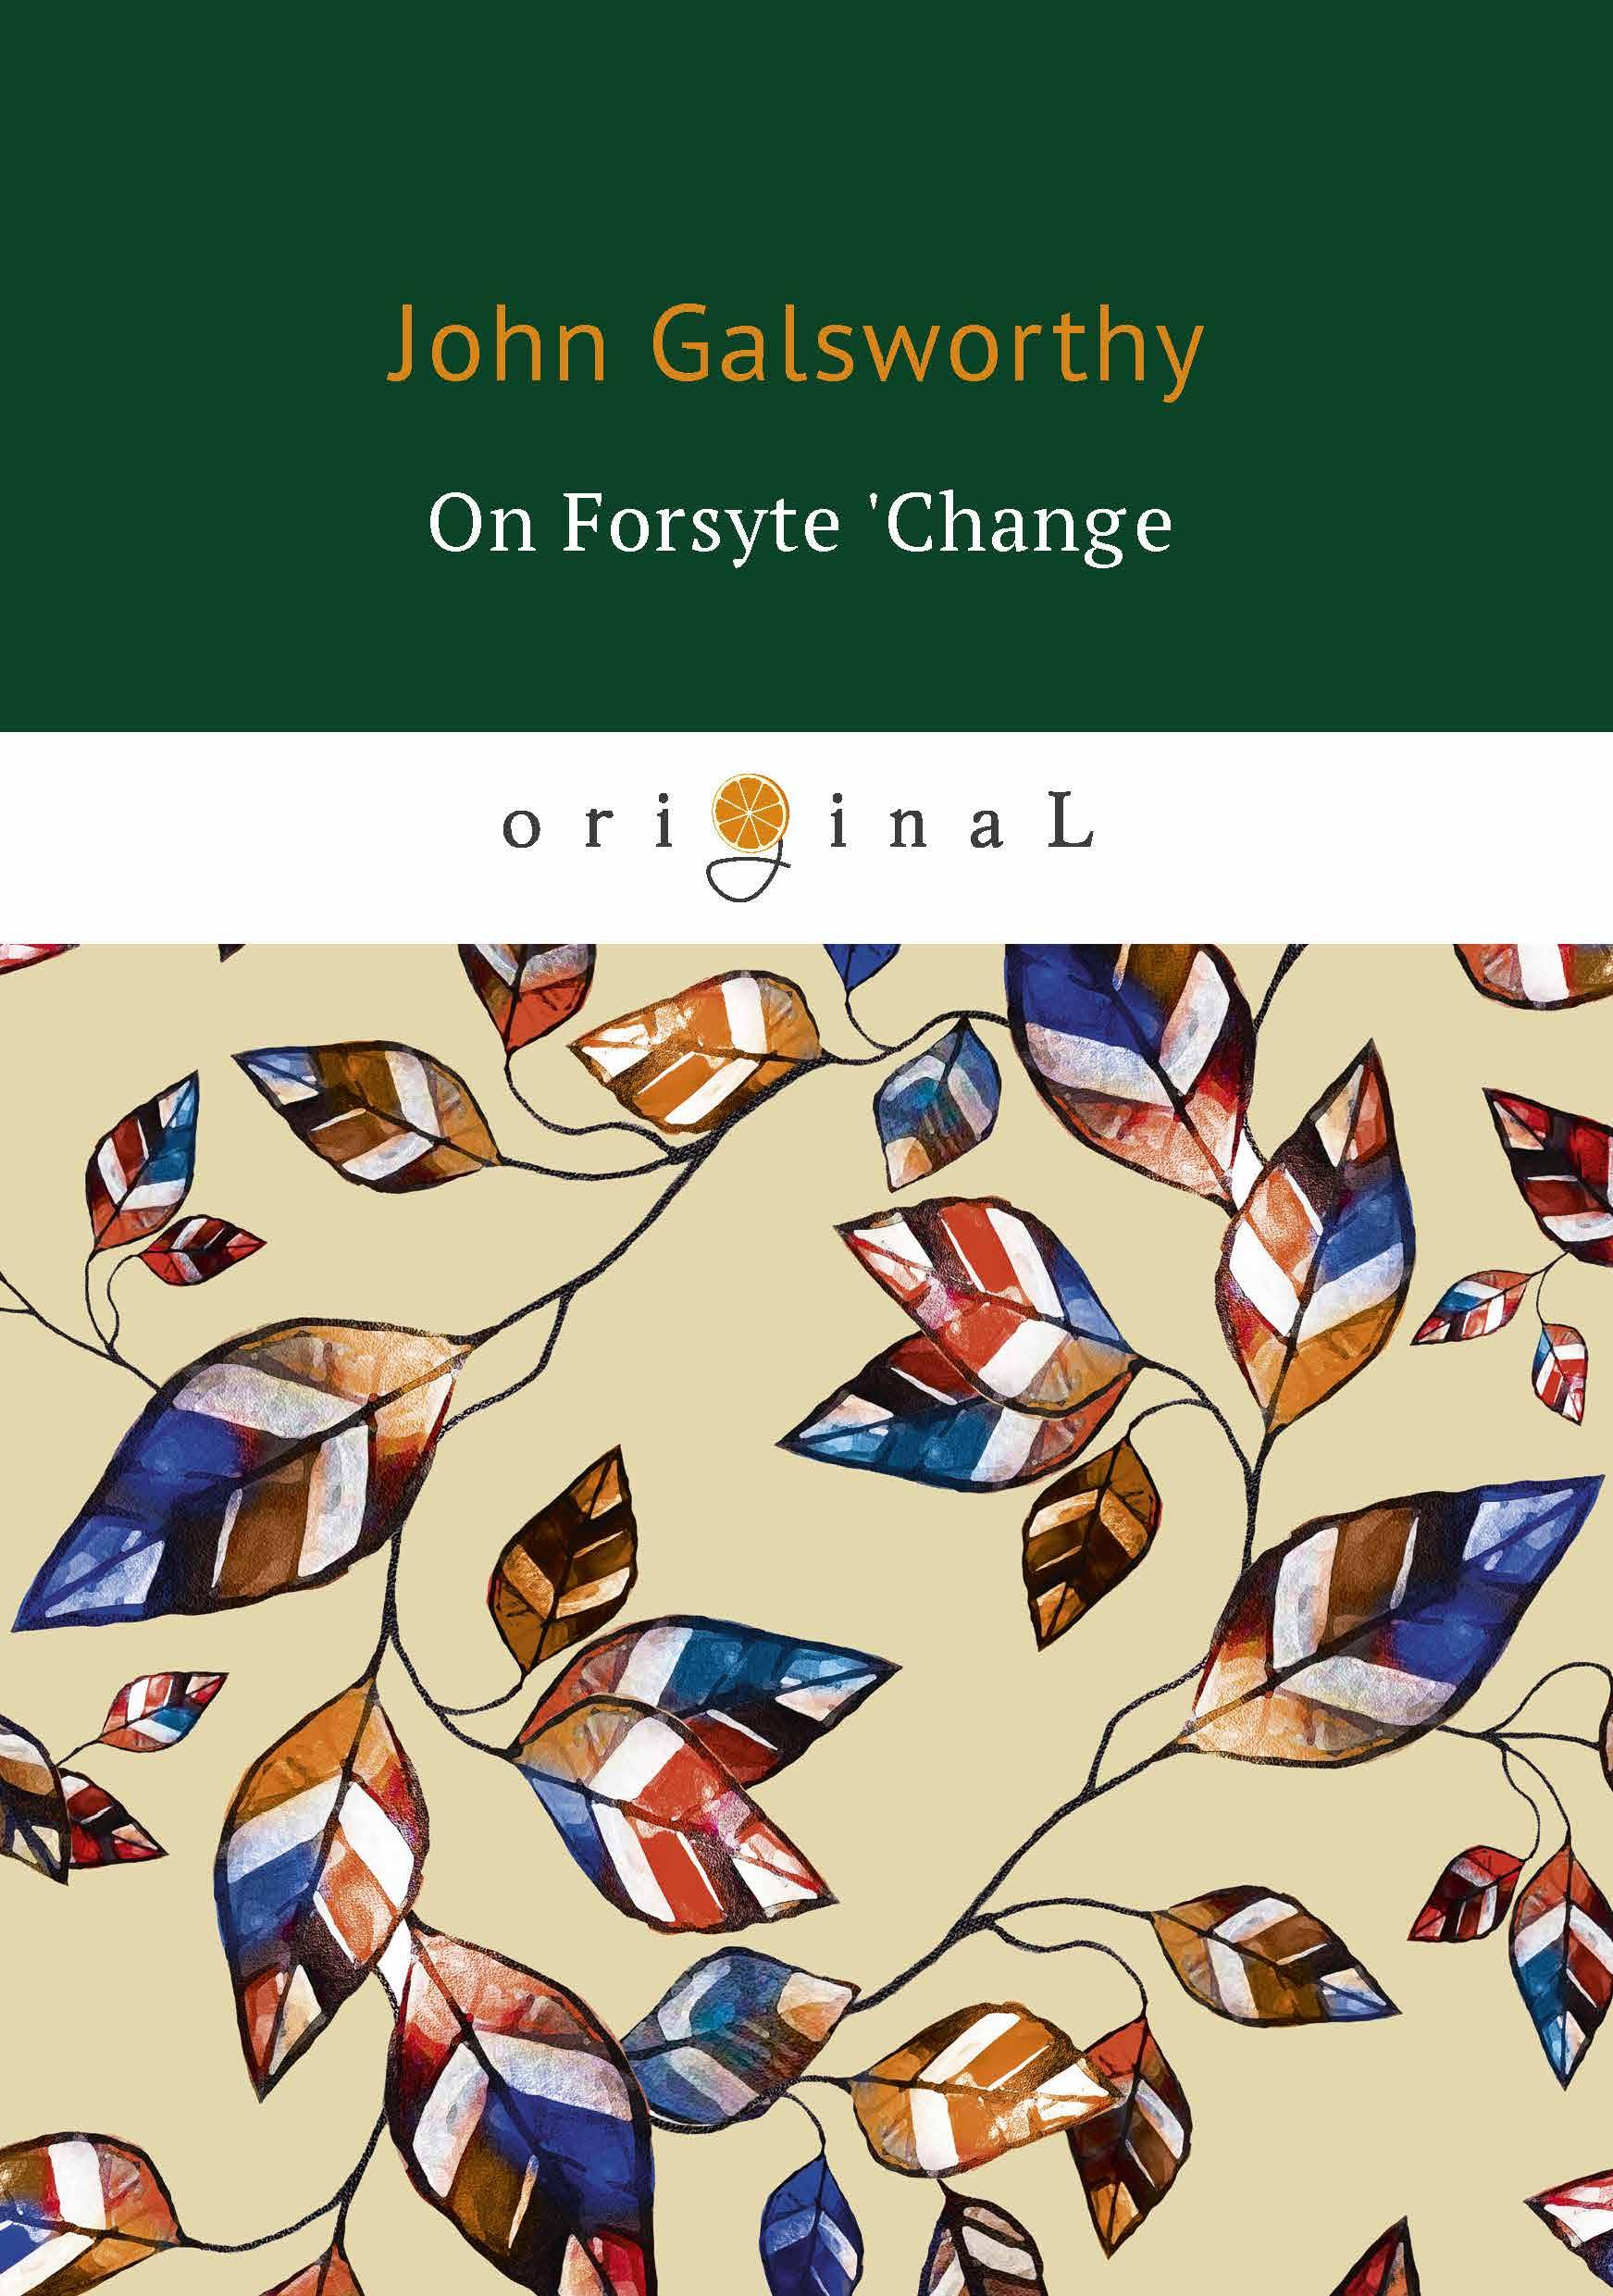 John Galsworthy On Forsyte 'Change ISBN: 978-5-521-06902-6 все цены